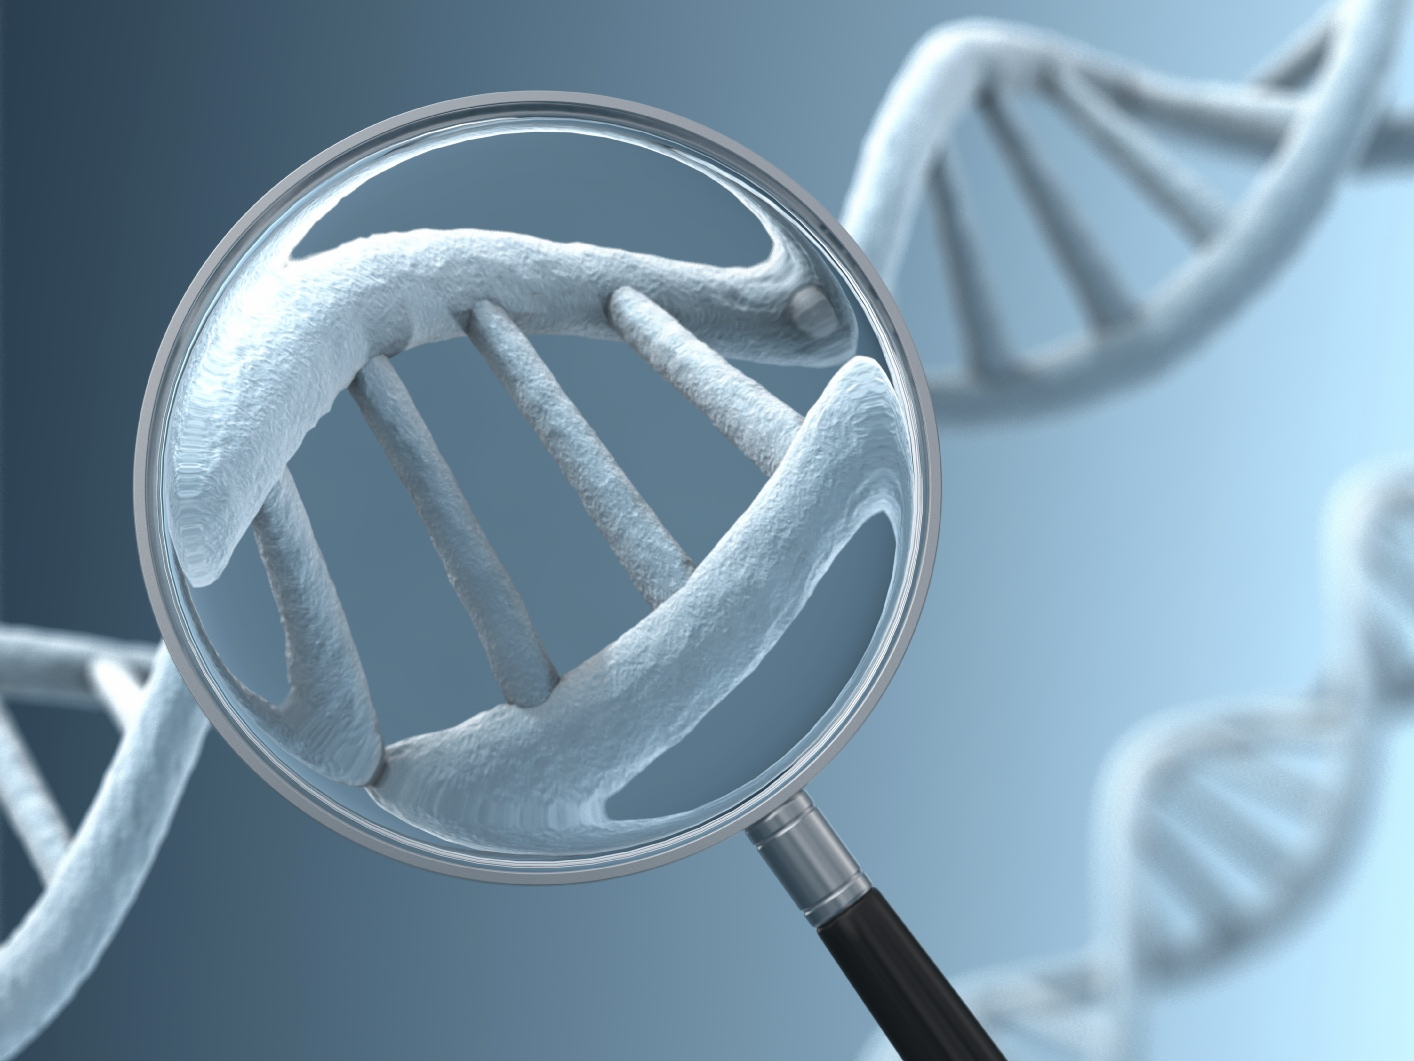 Berry Genomics Completes $619M Back-Door Listing In Shenzhen